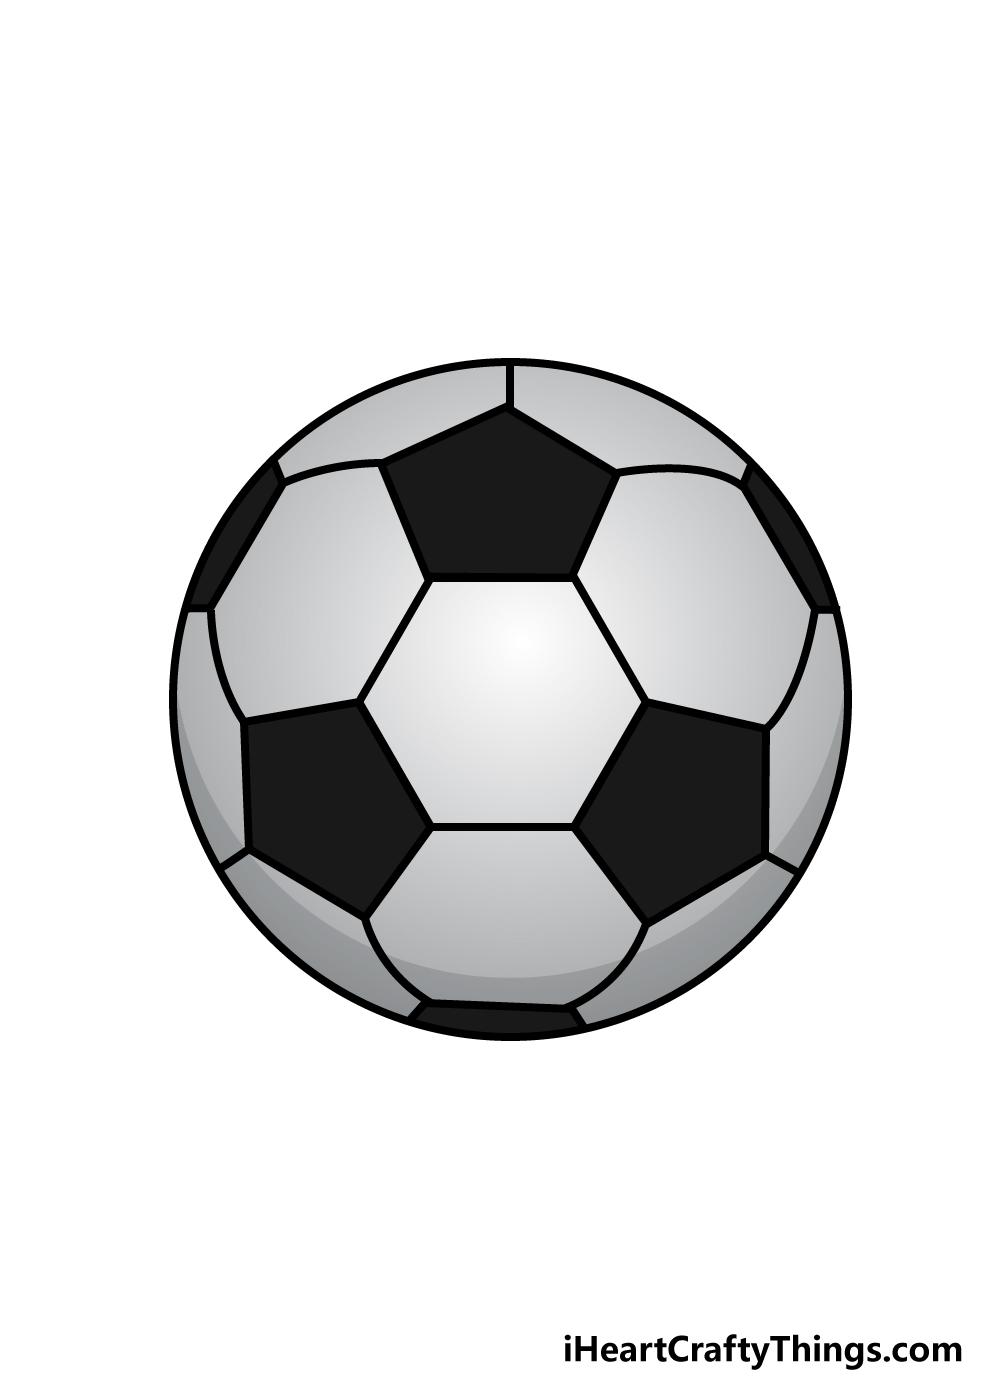 soccer ball drawing step 6